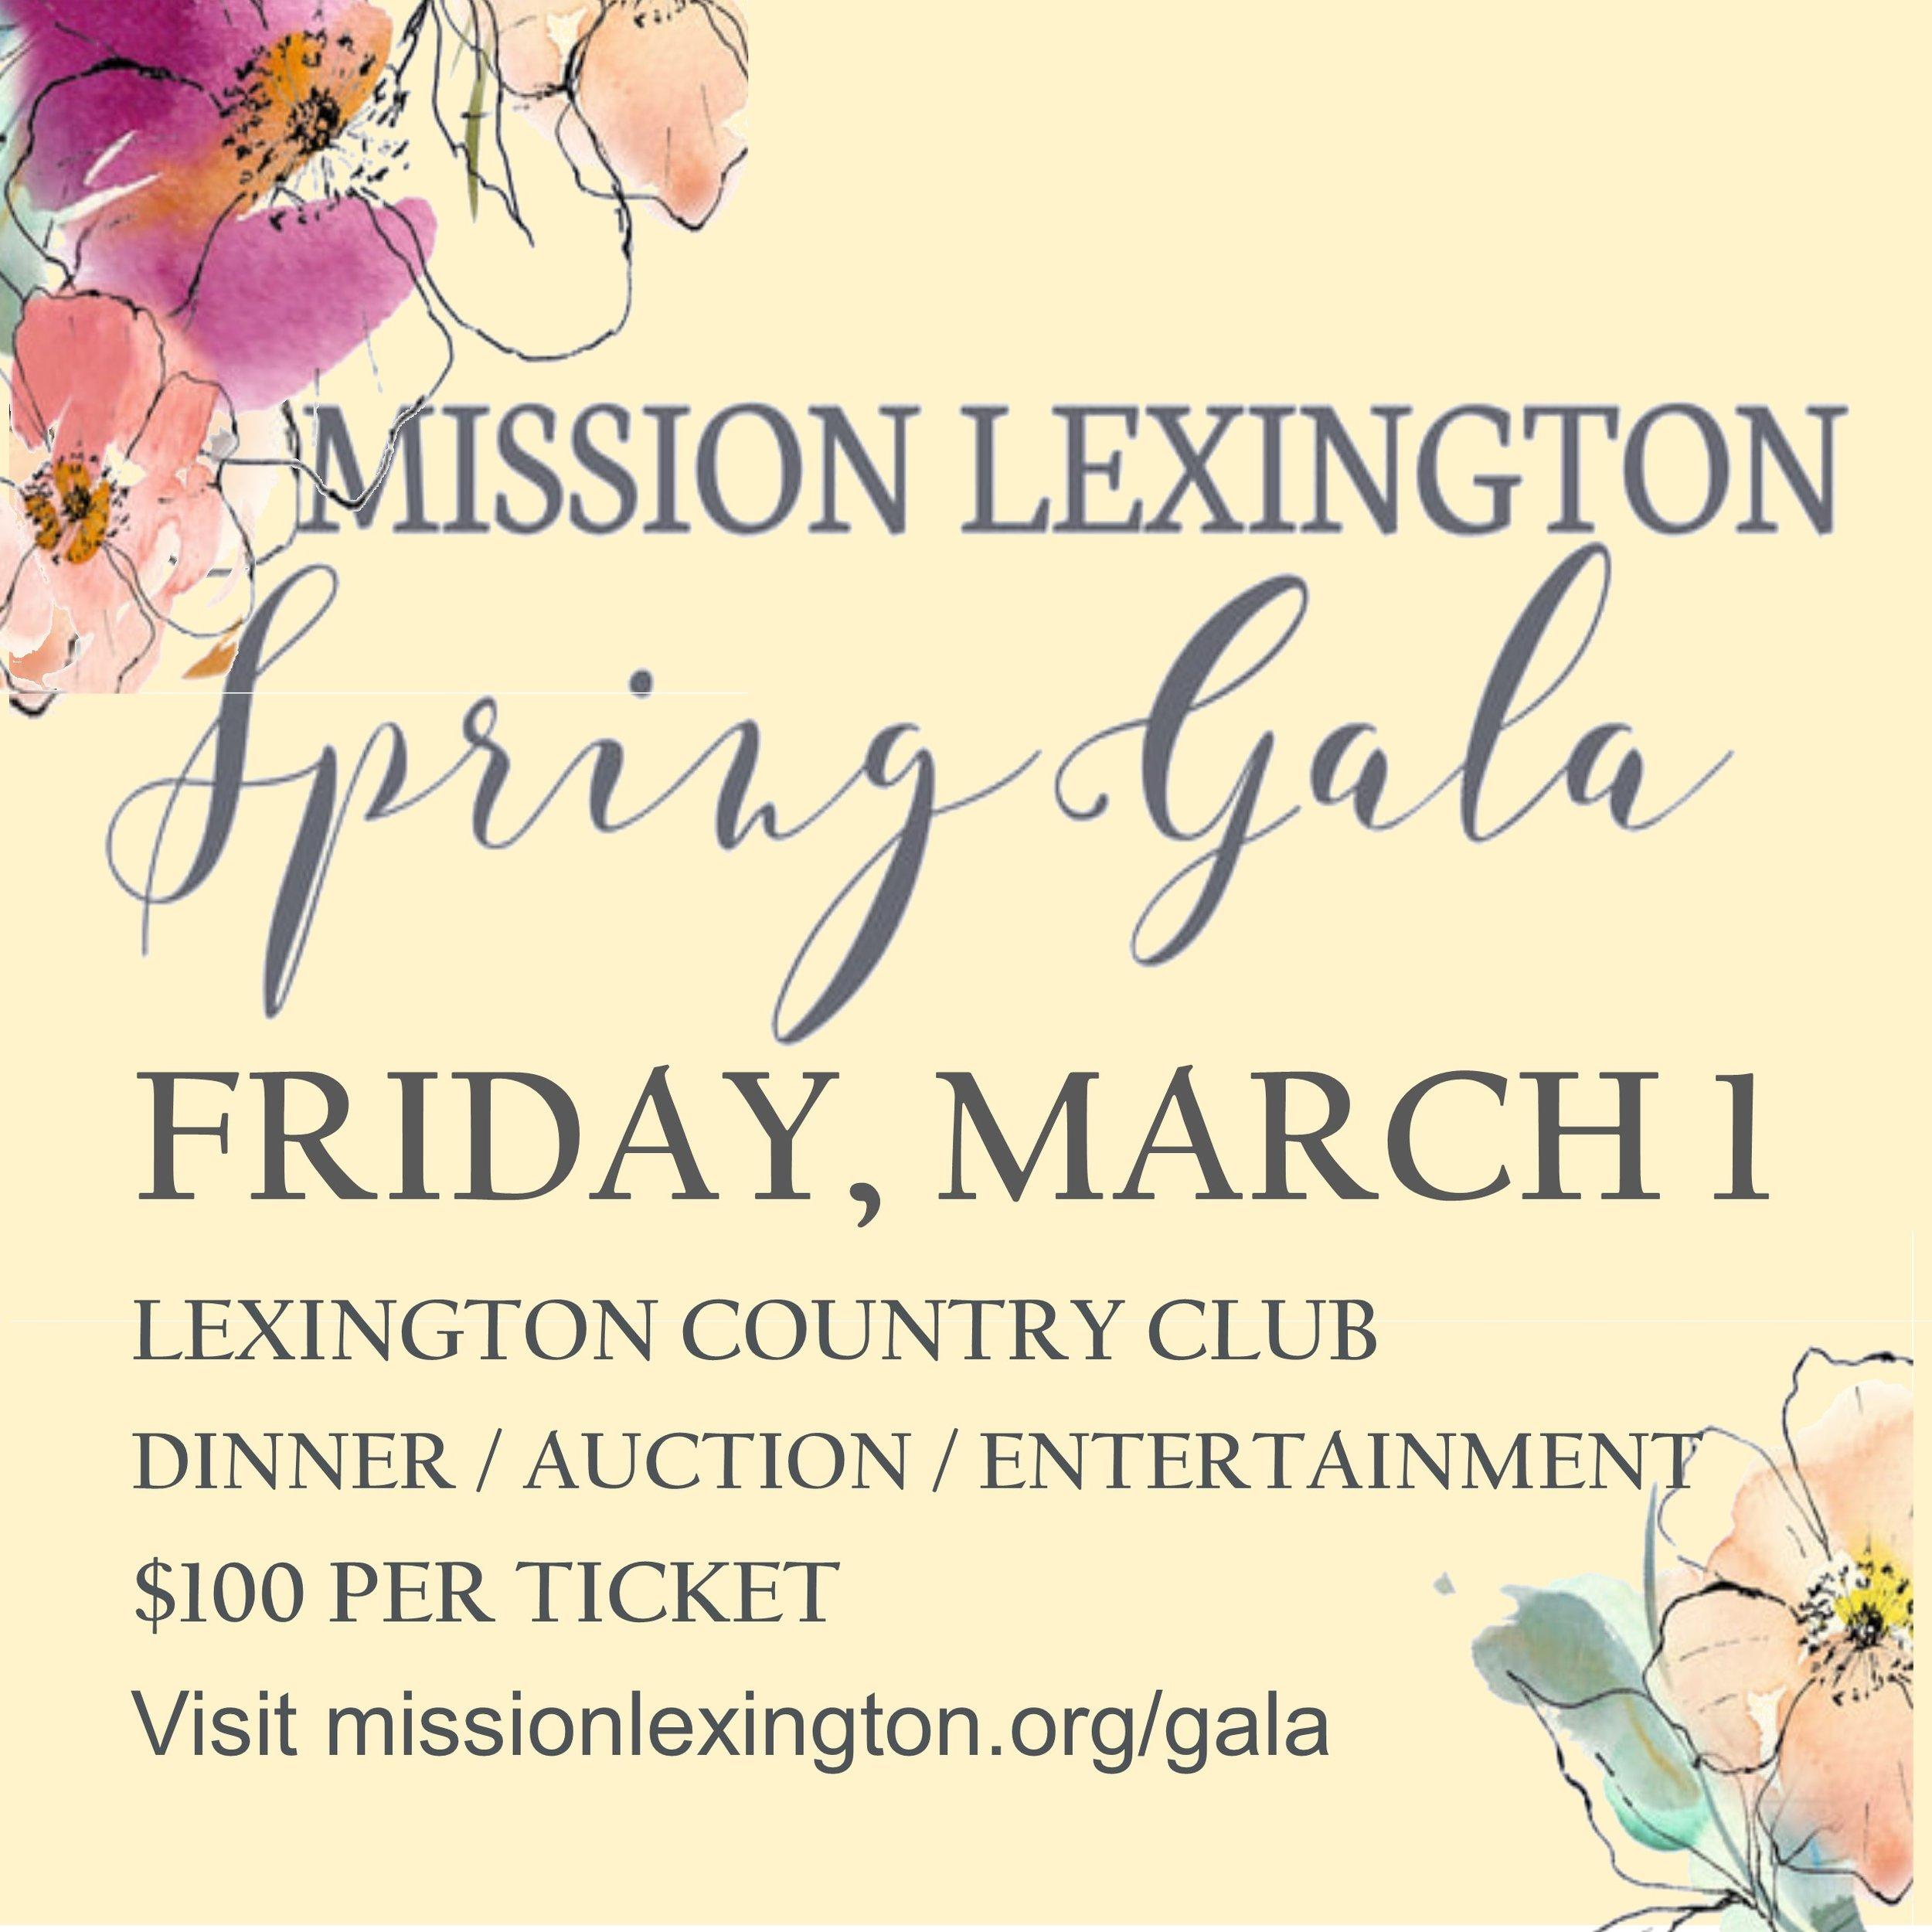 Mission Lexington Gala insta  012819.jpg